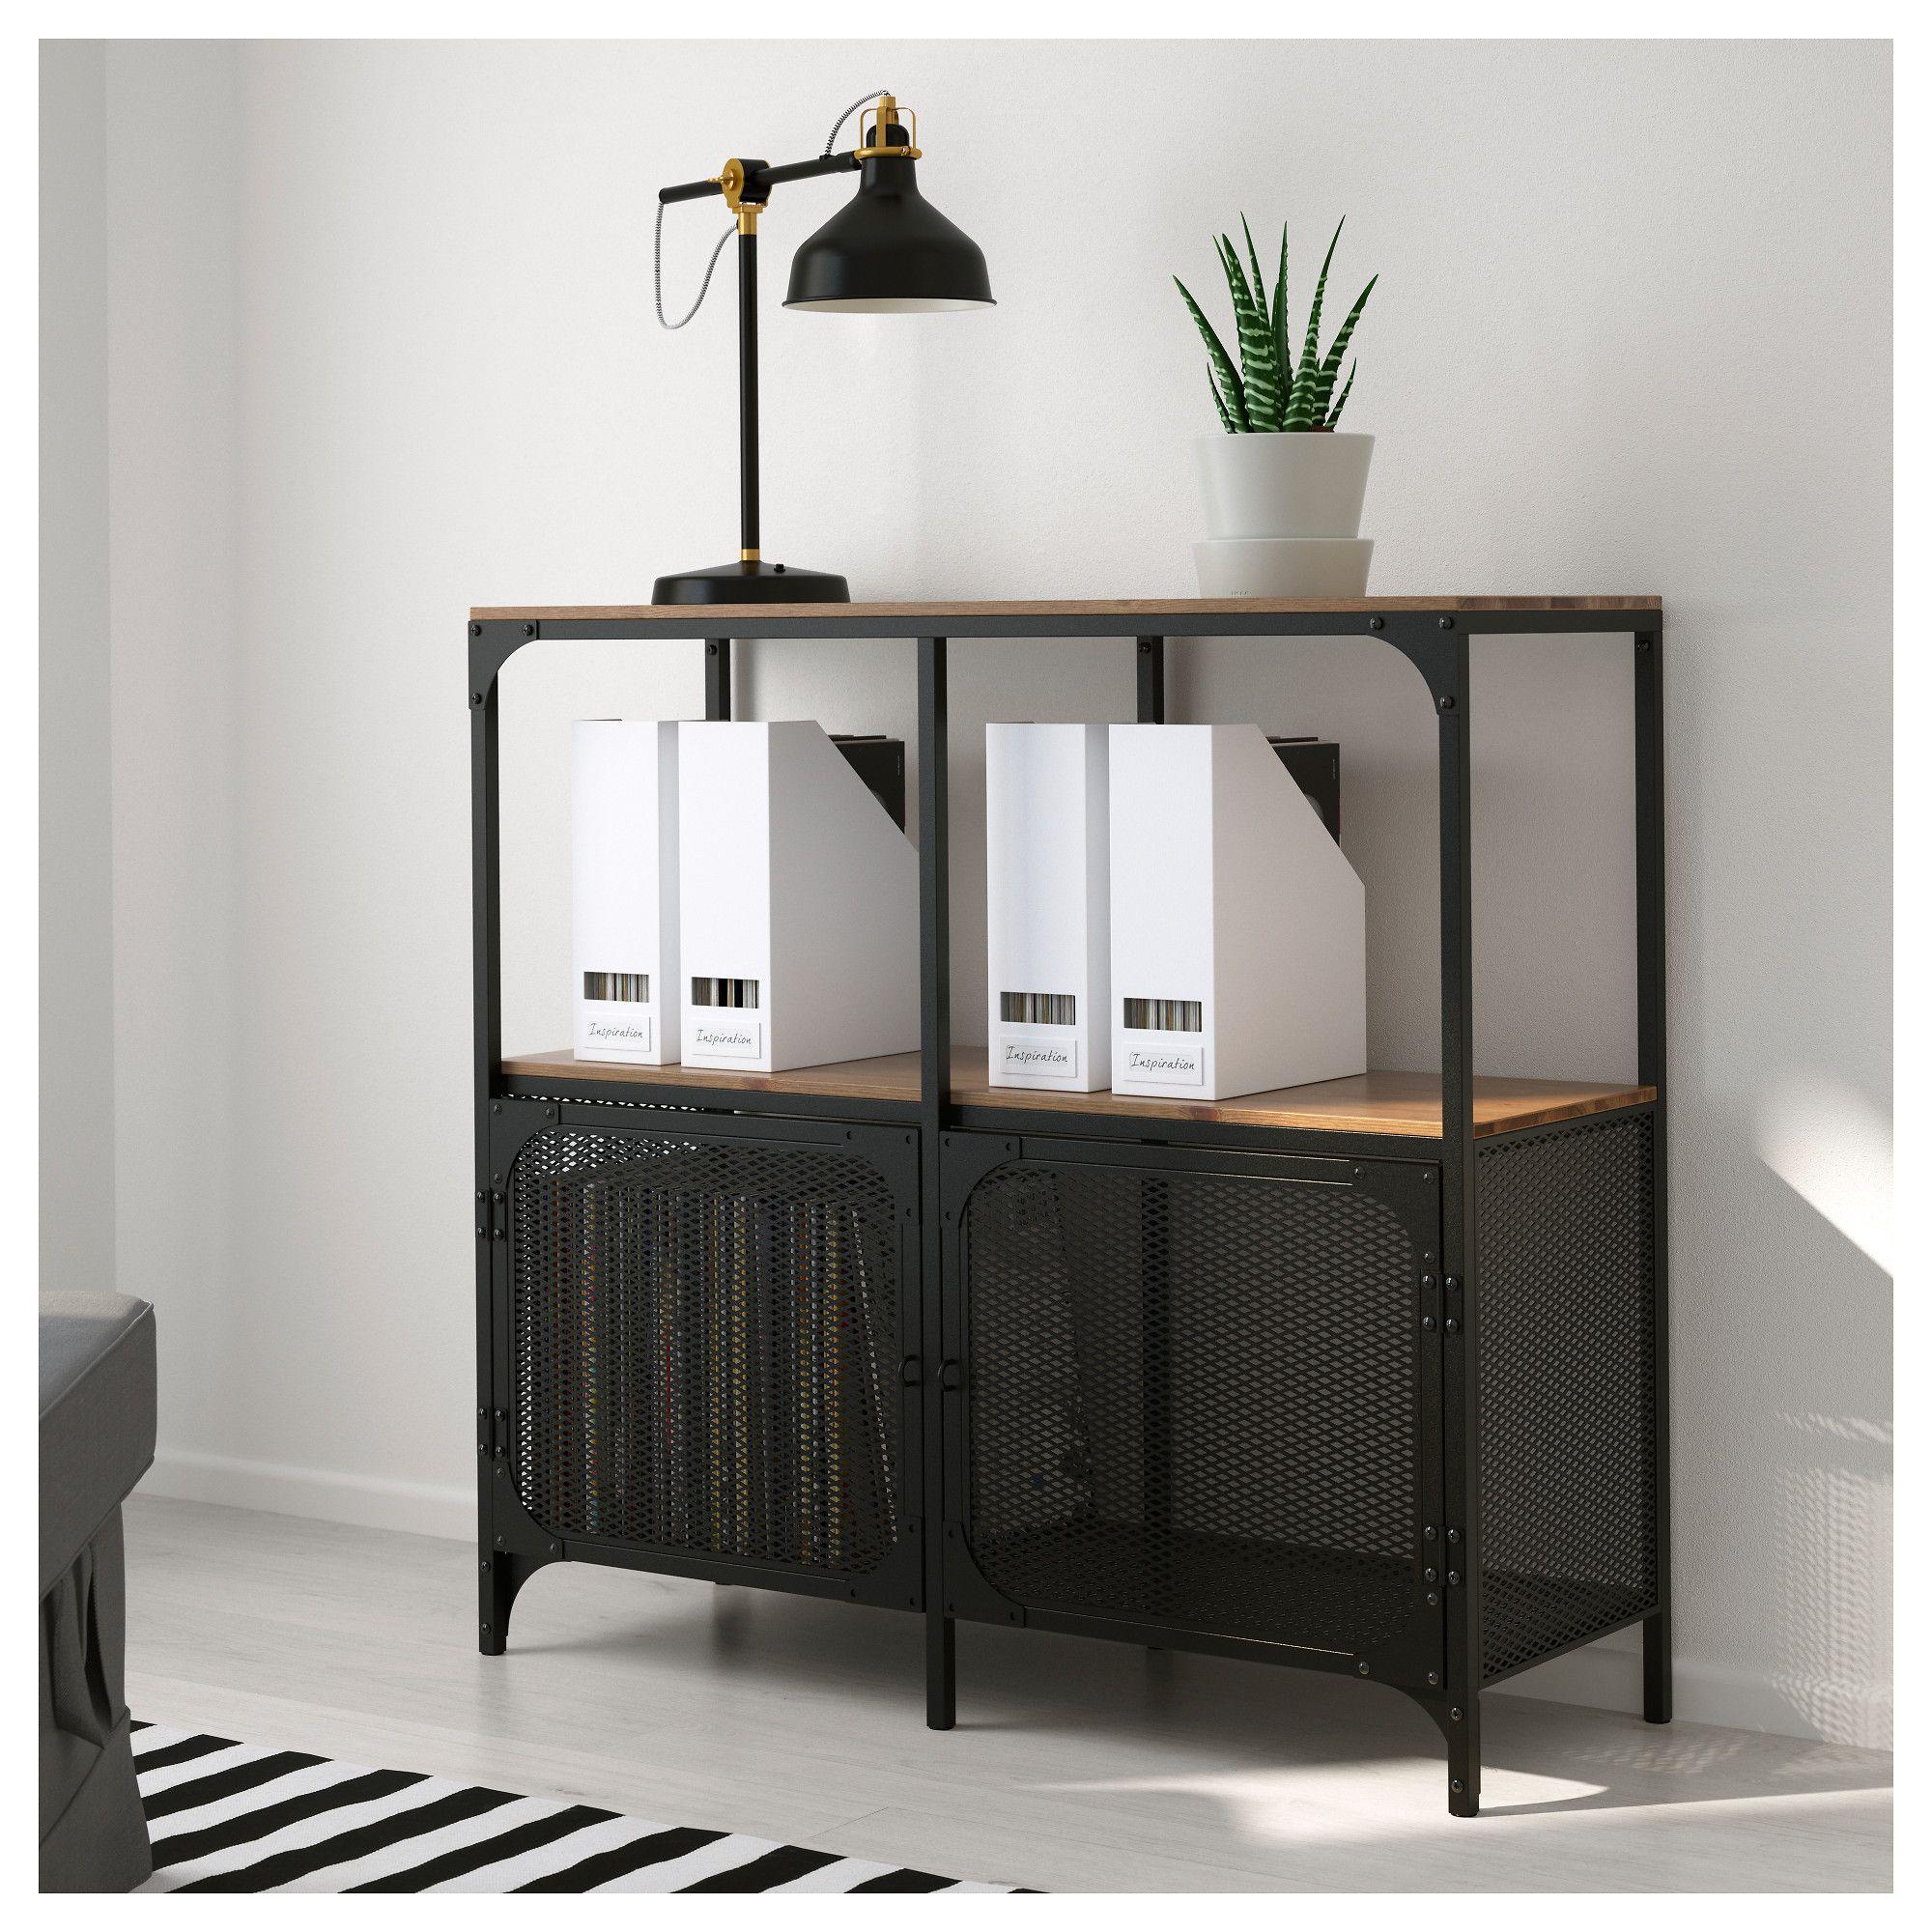 "IKEA FJ""LLBO Shelf unit black"